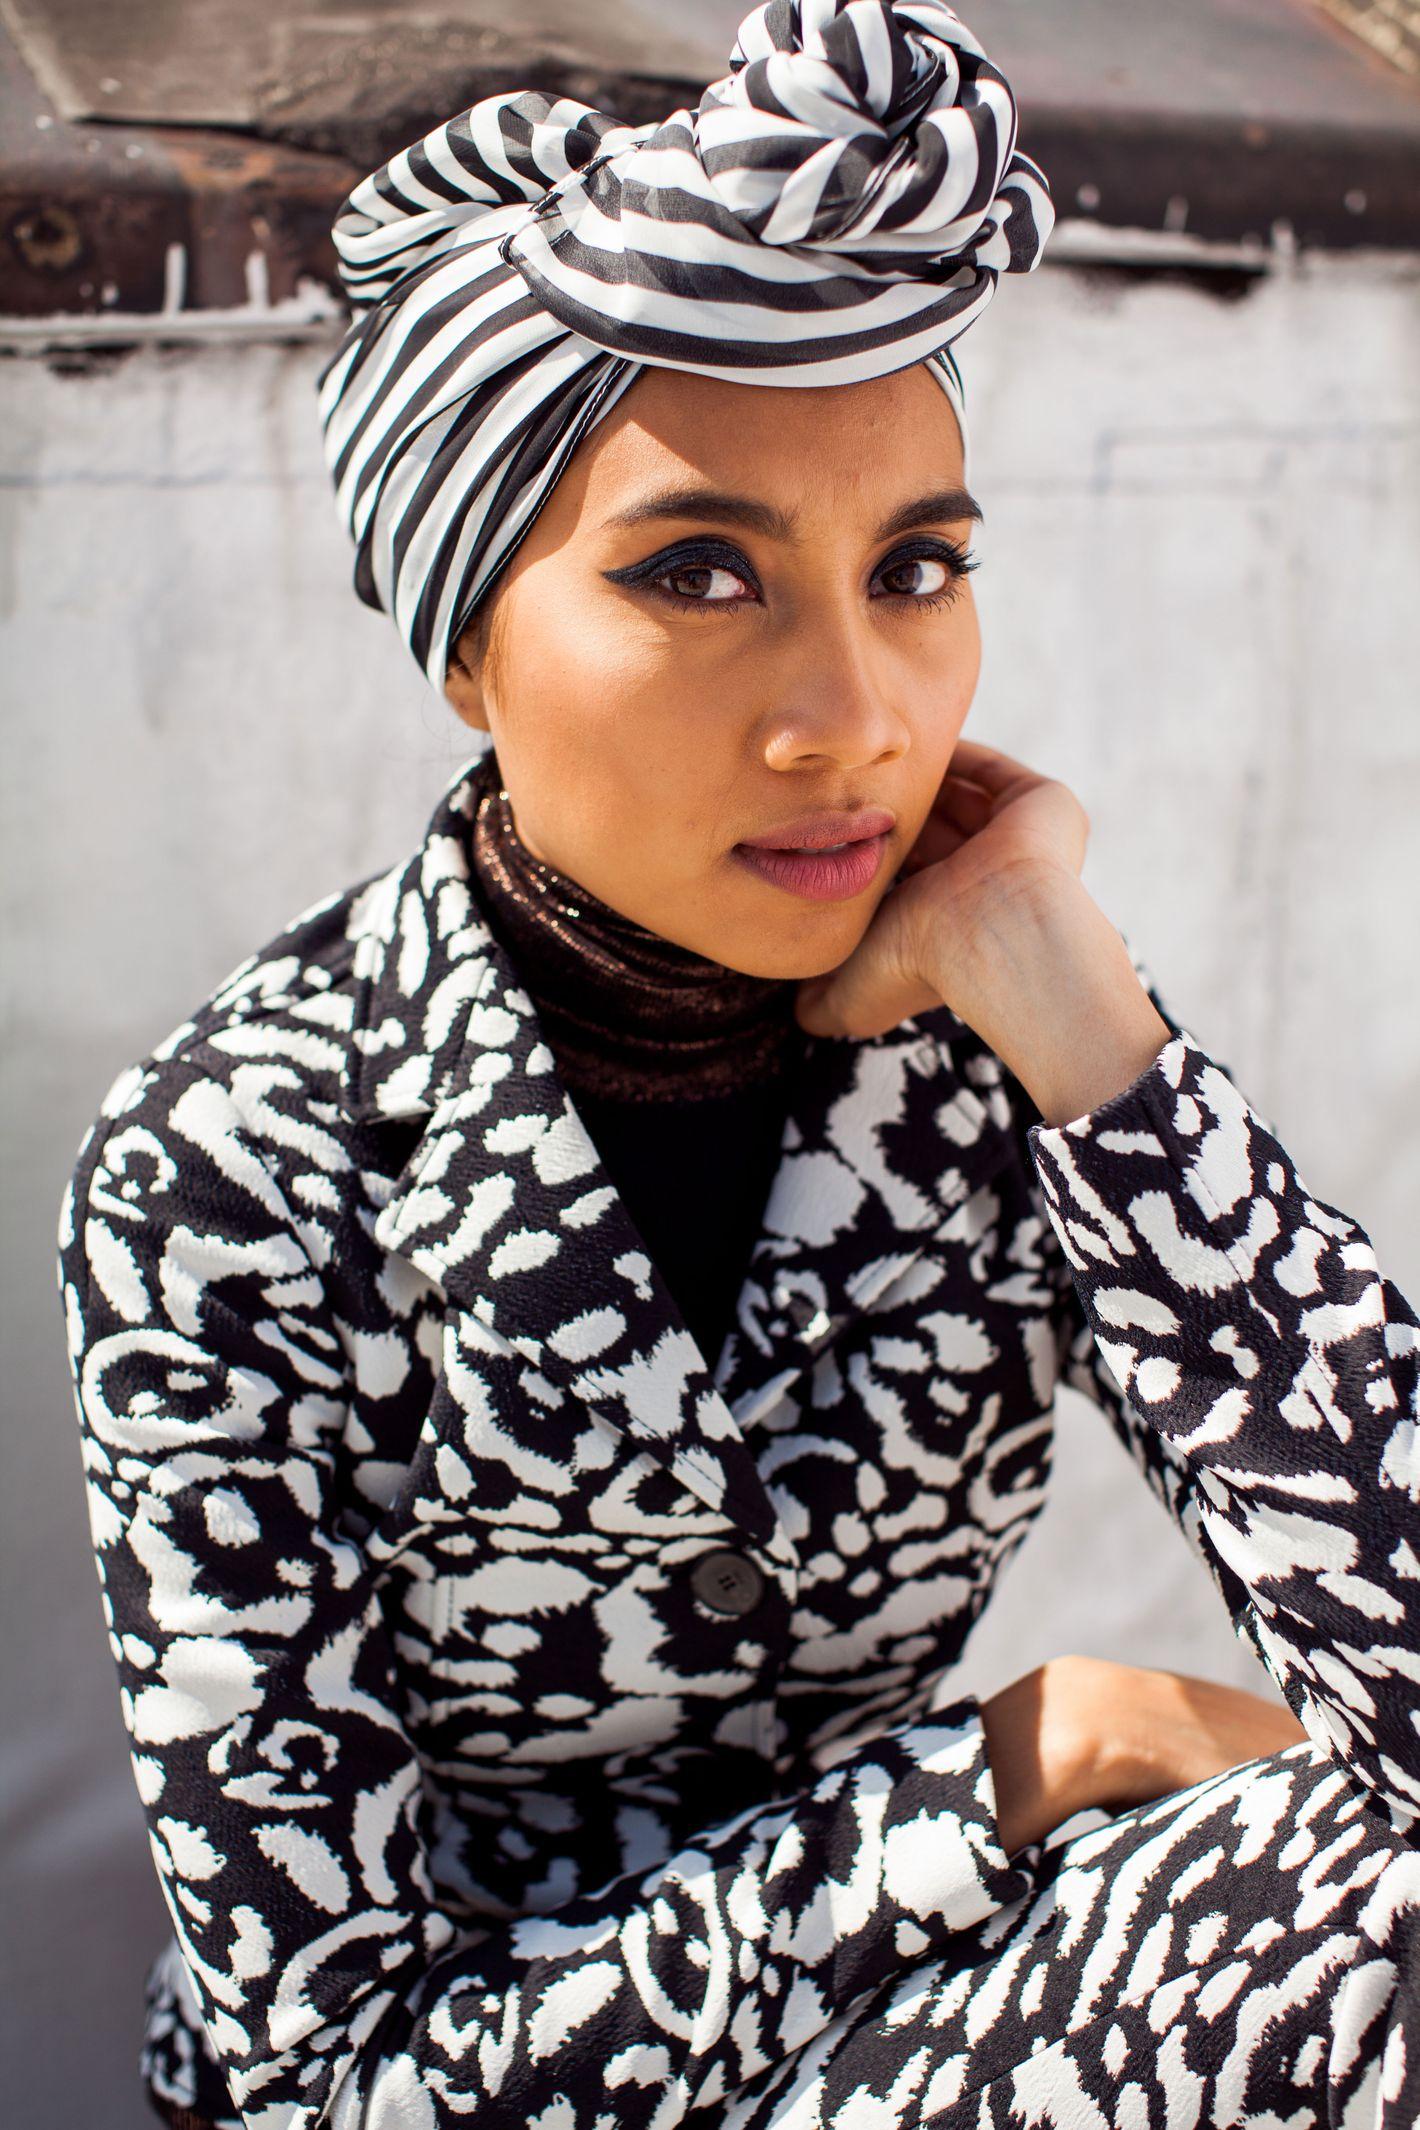 Malaysian Pop Superstar Yuna on Fashion, Race, and Not ...